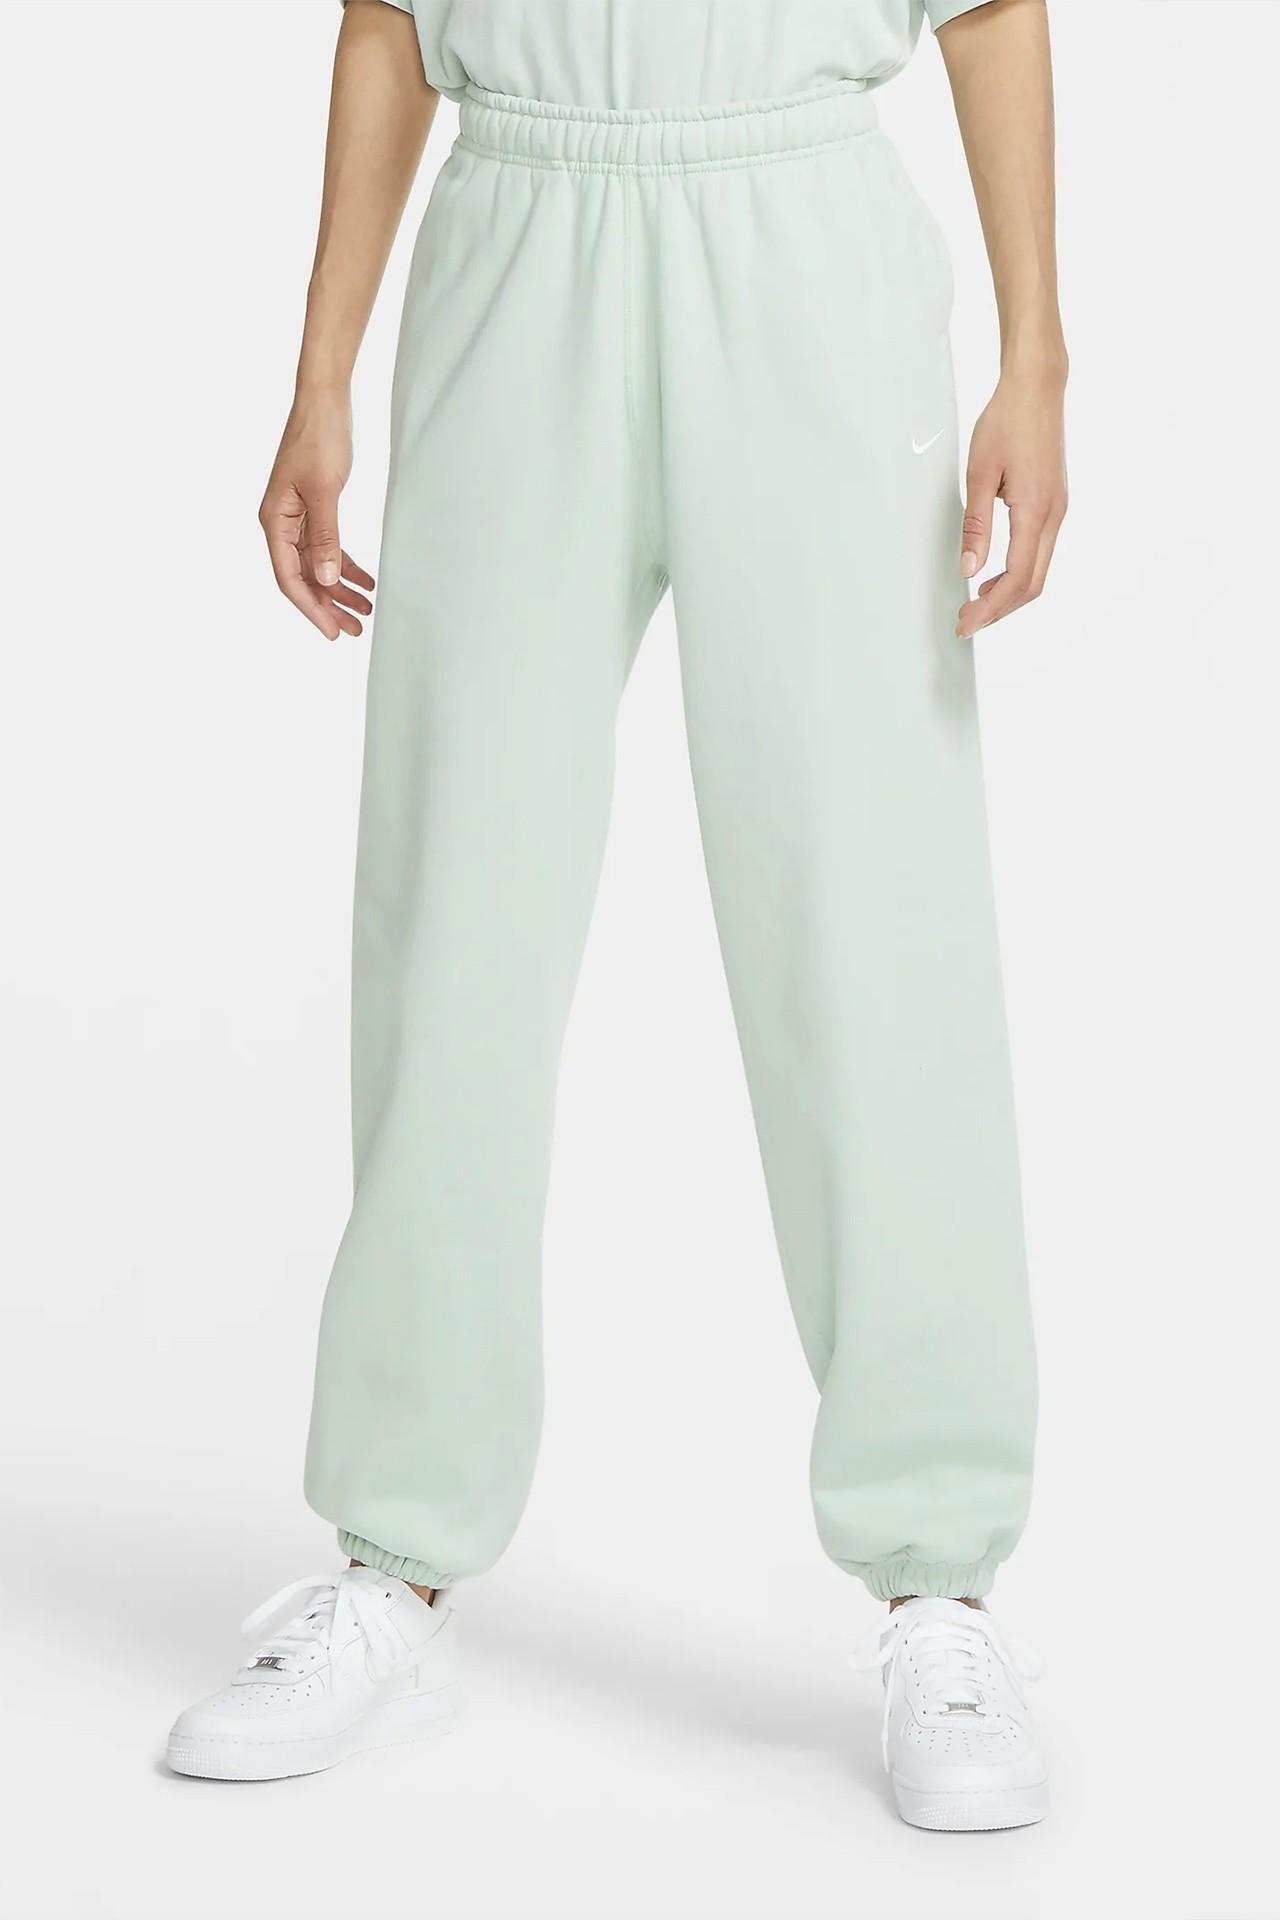 nike nikelab womens washed pants fleece sweatpants release price